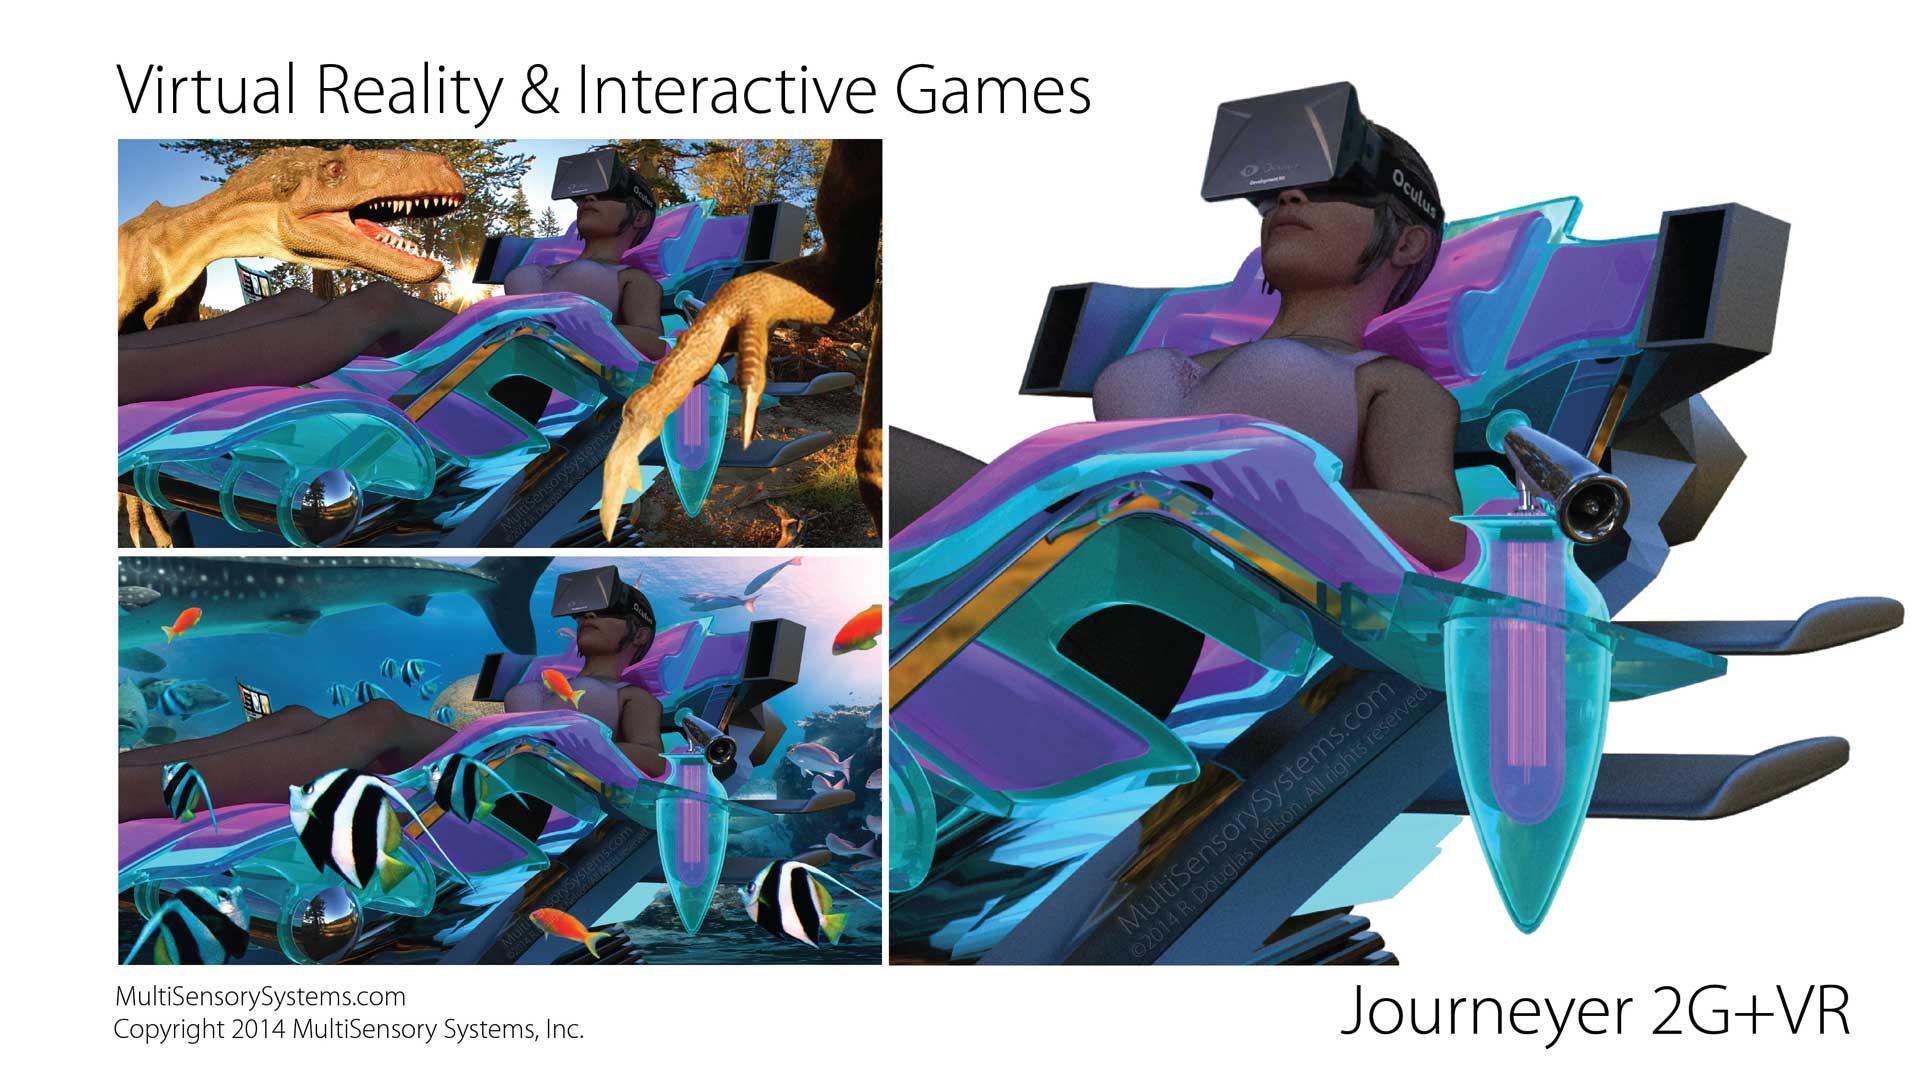 Virtual Reality & Interactive Games